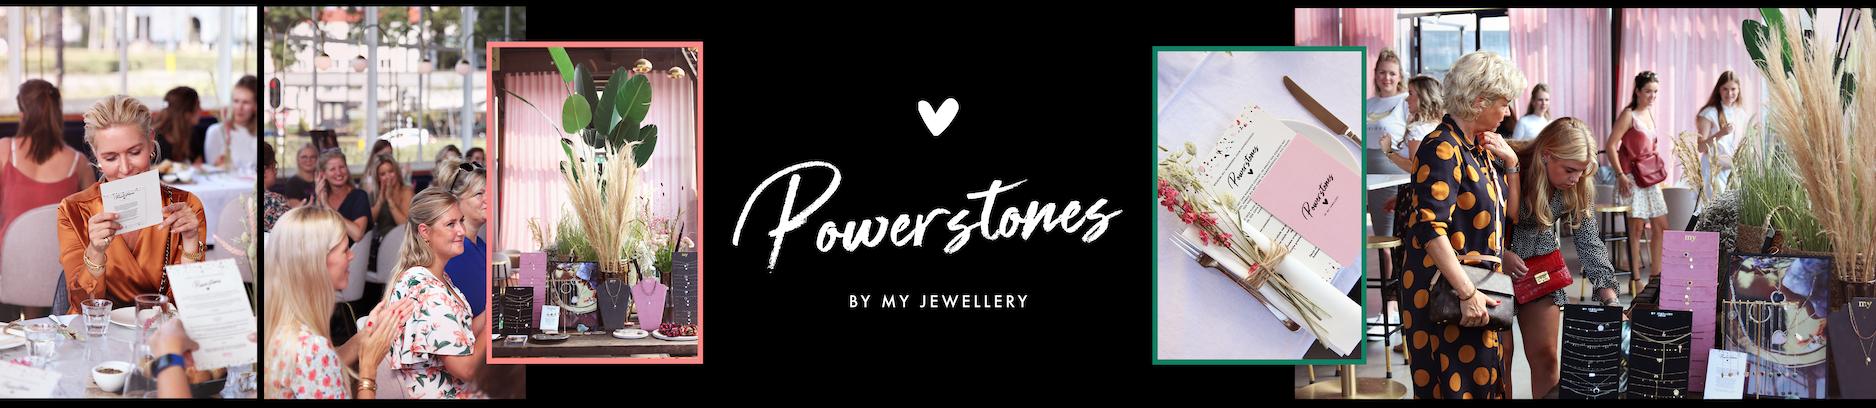 Powerstones event retailers